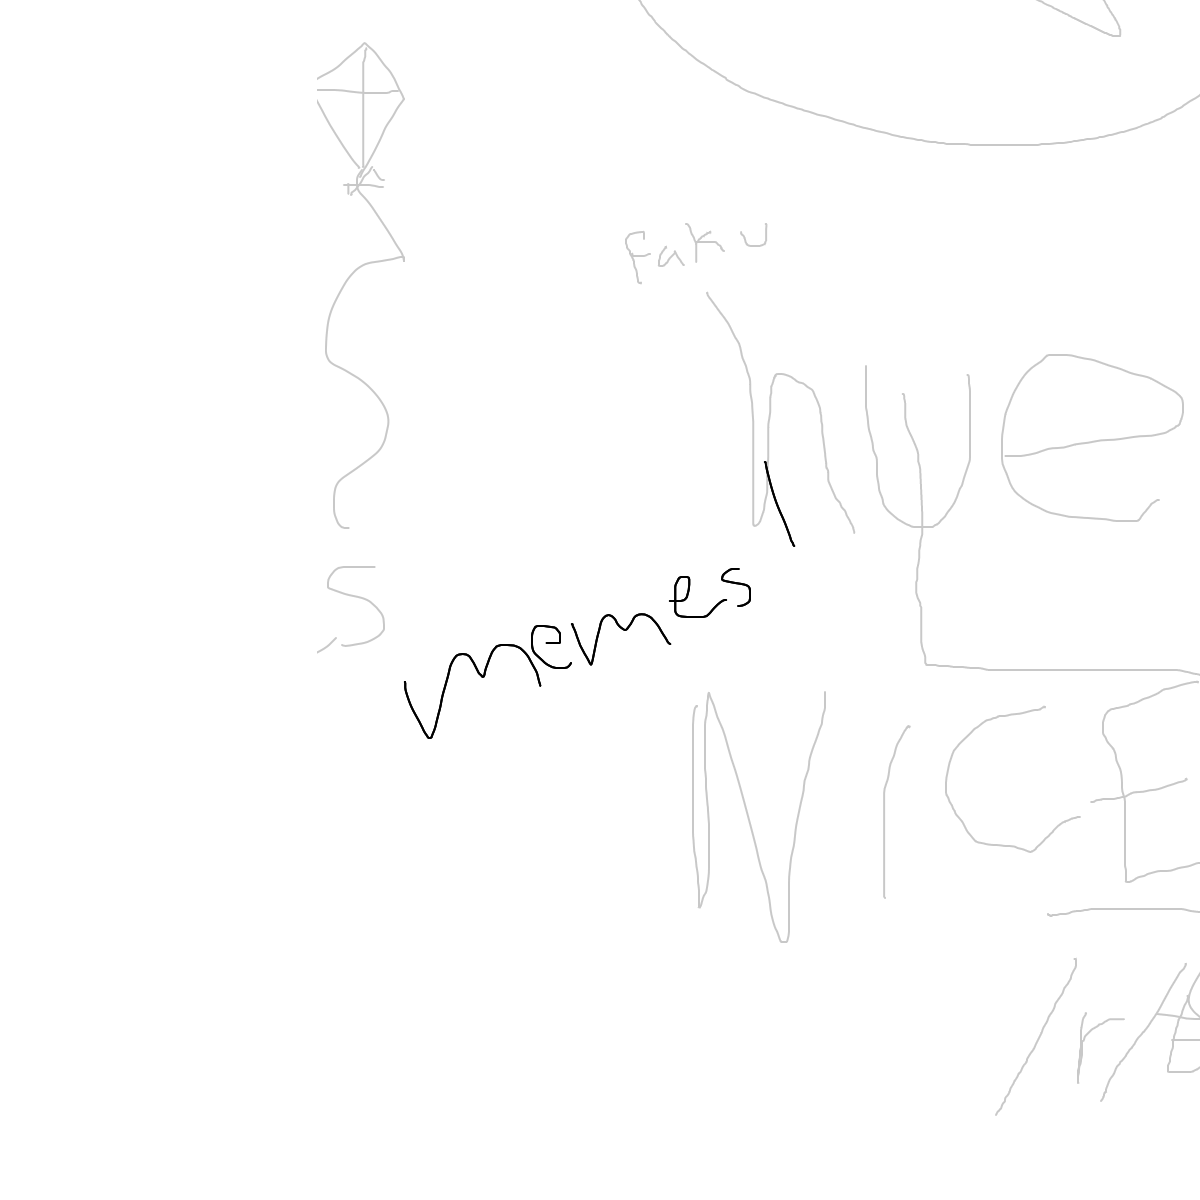 BAAAM drawing#7105 lat:-12.0500631332397460lng: -51.5039367675781250